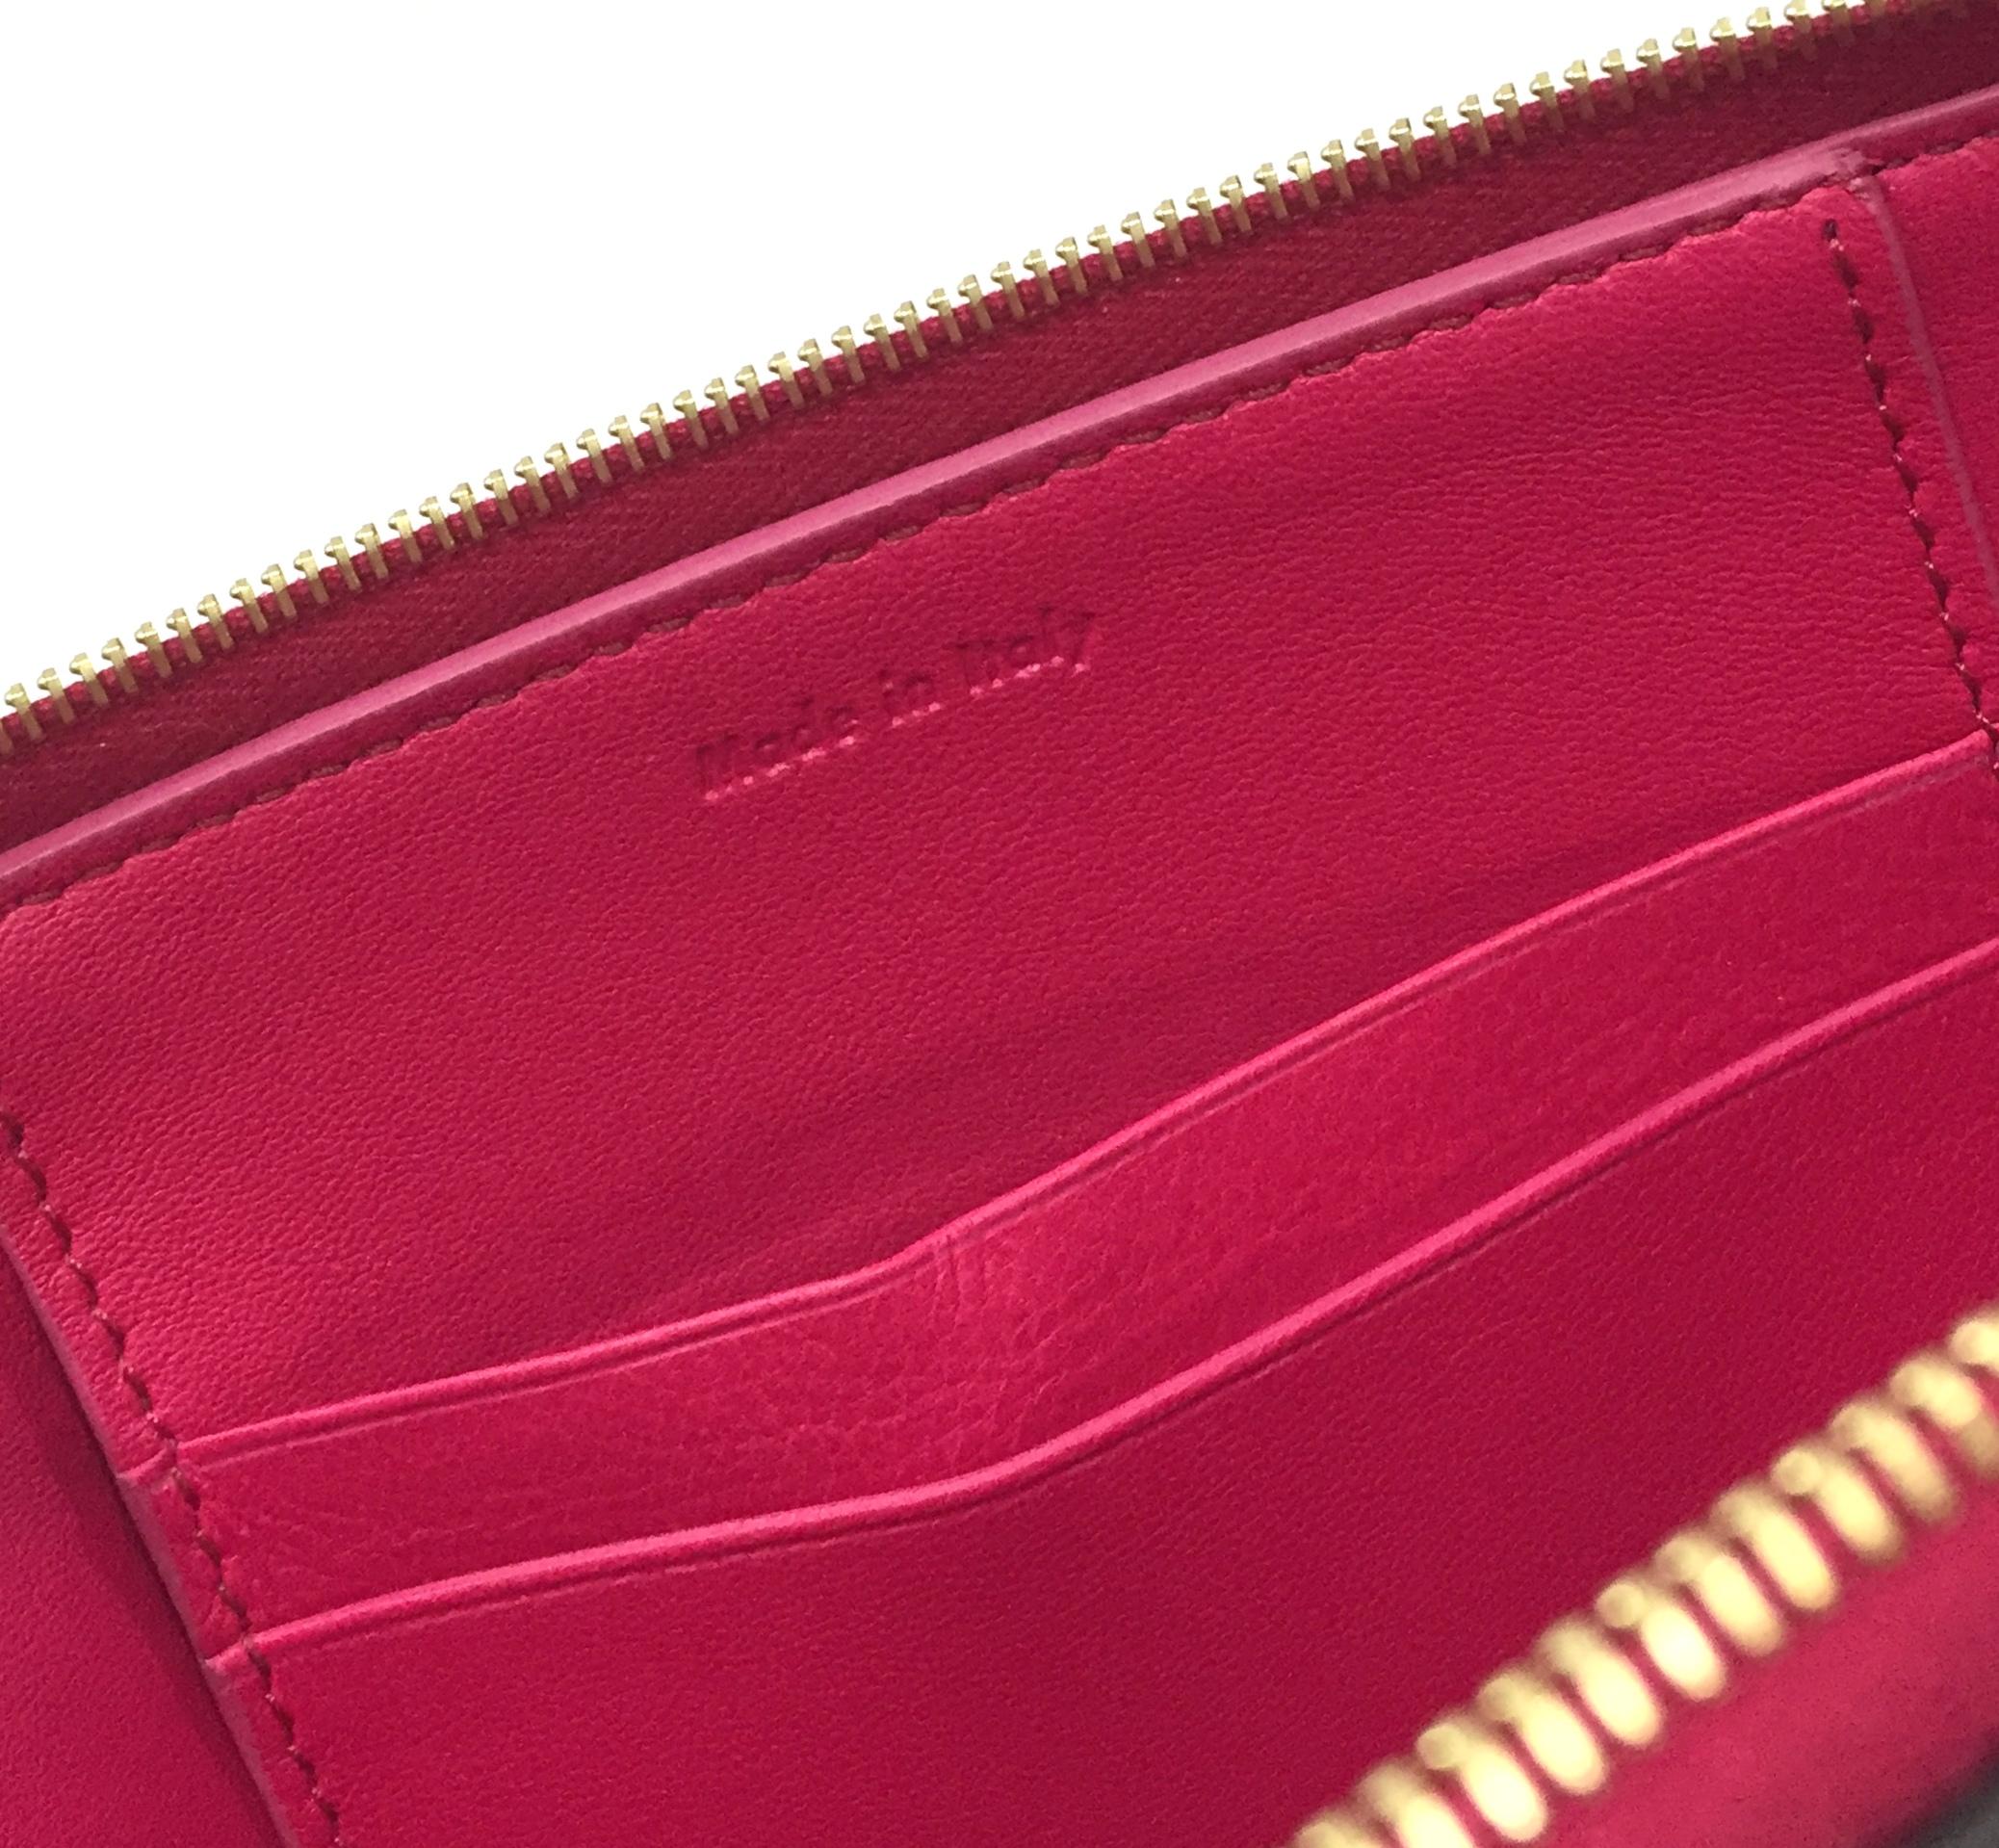 Celine Fuschia and Cream Leather Pocket Clutch Handbag | Alexis ...